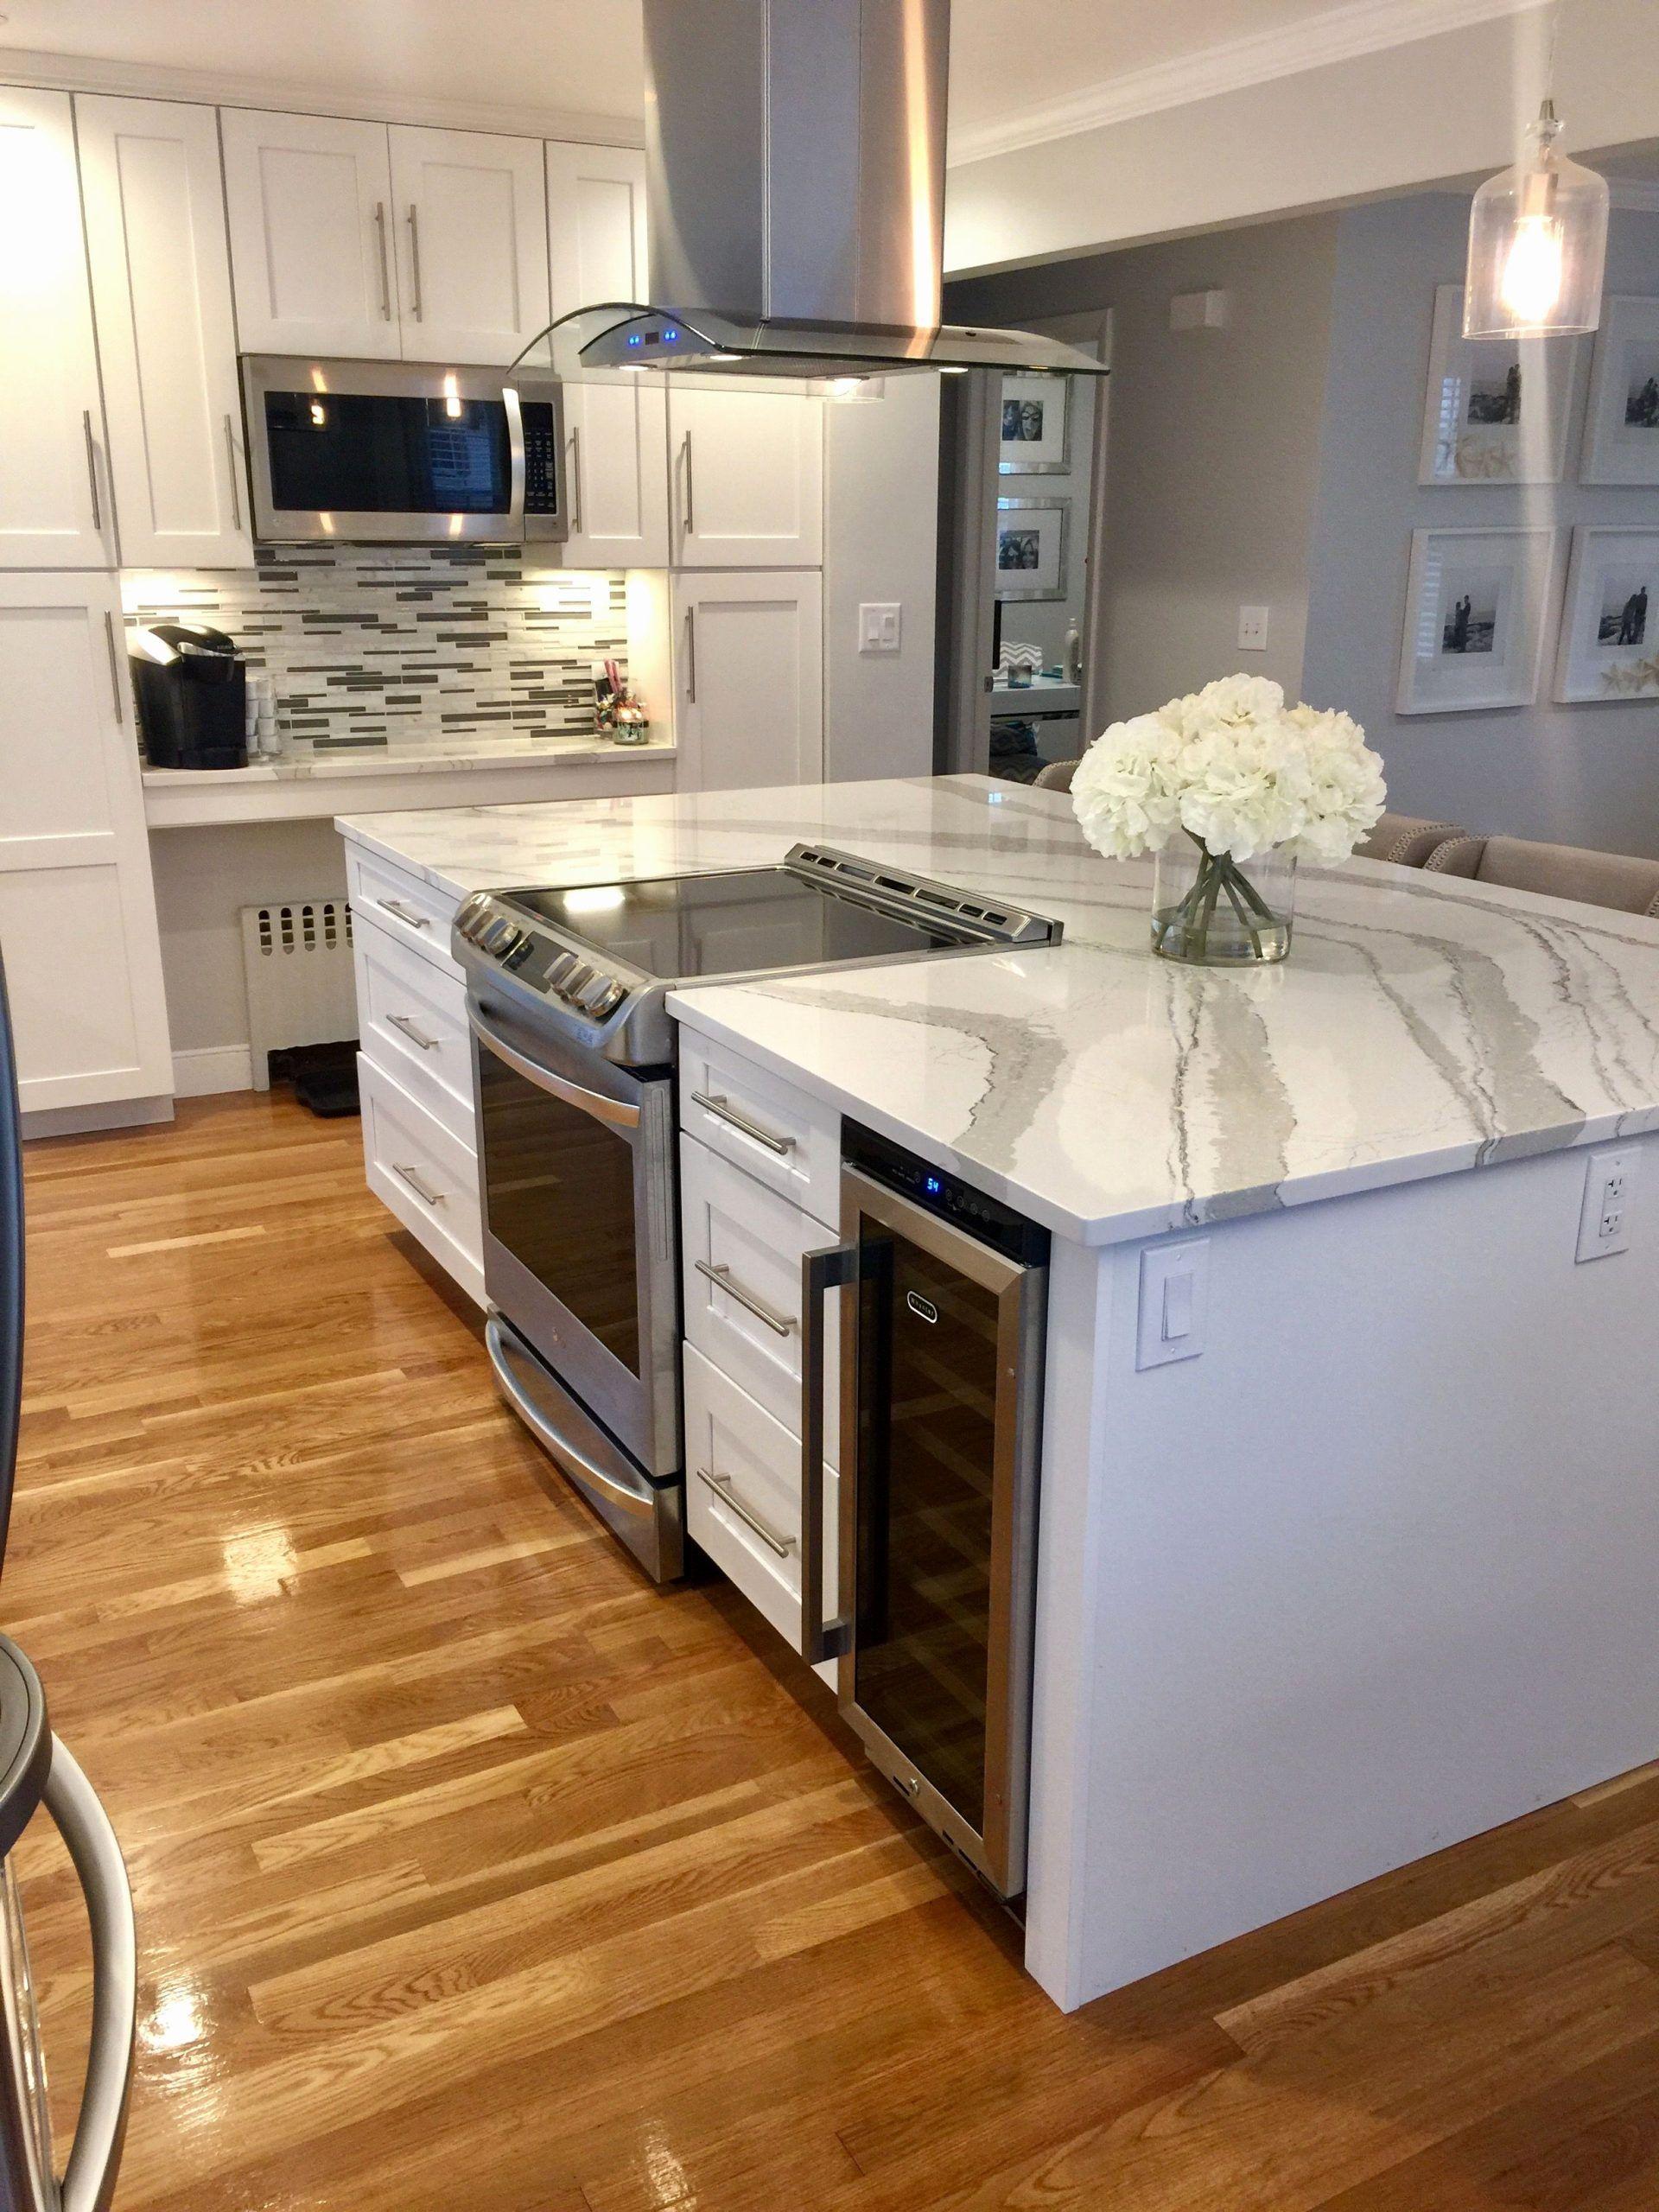 Open Kitchen Plans With Island Elegant Huge Quartz Island With Stove And Wine Fridge Open Flo Elegant Kitchen Island Kitchen Remodel Small Diy Kitchen Flooring